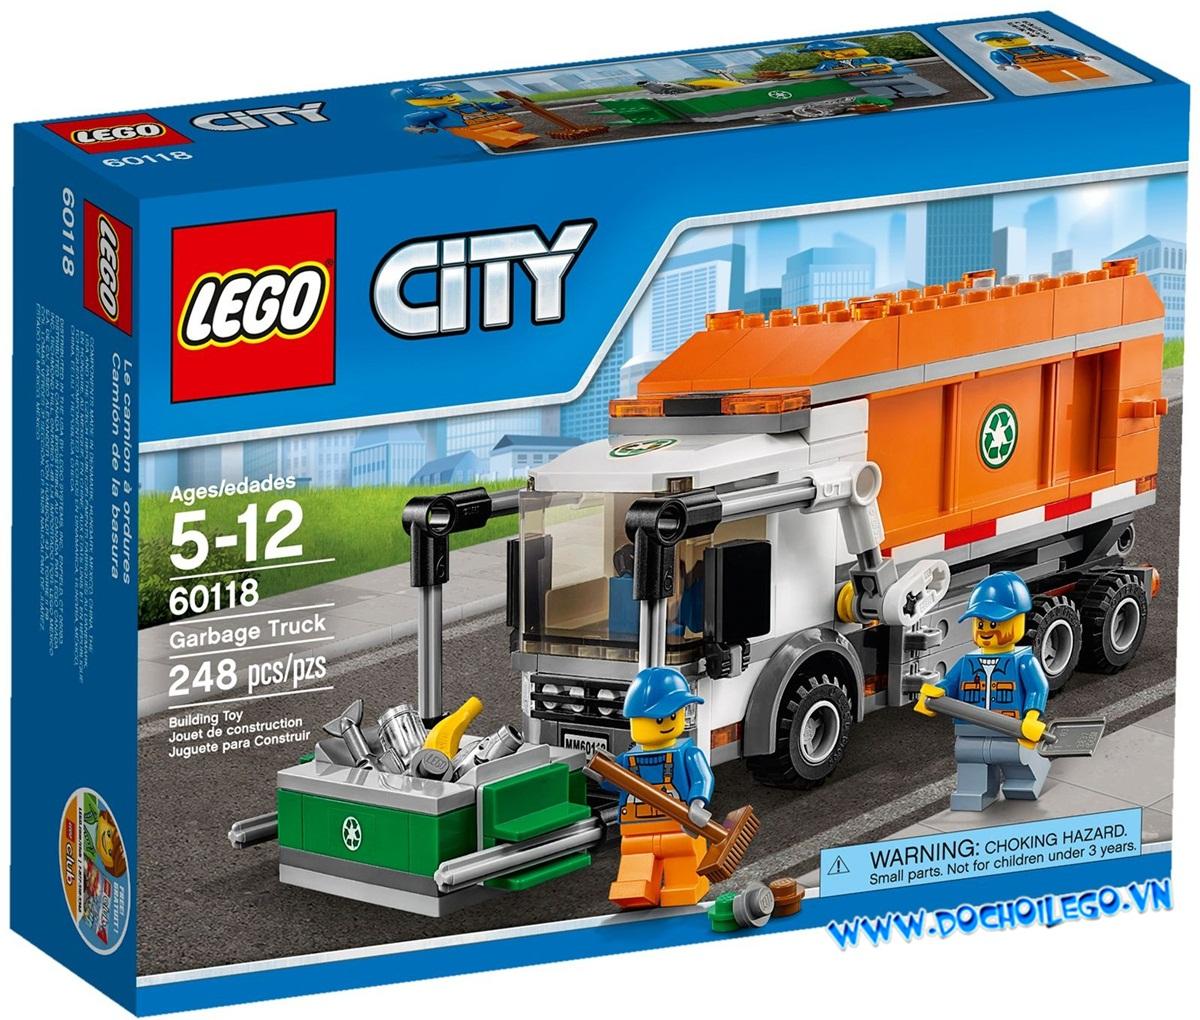 60118 LEGO City Garbage Truck